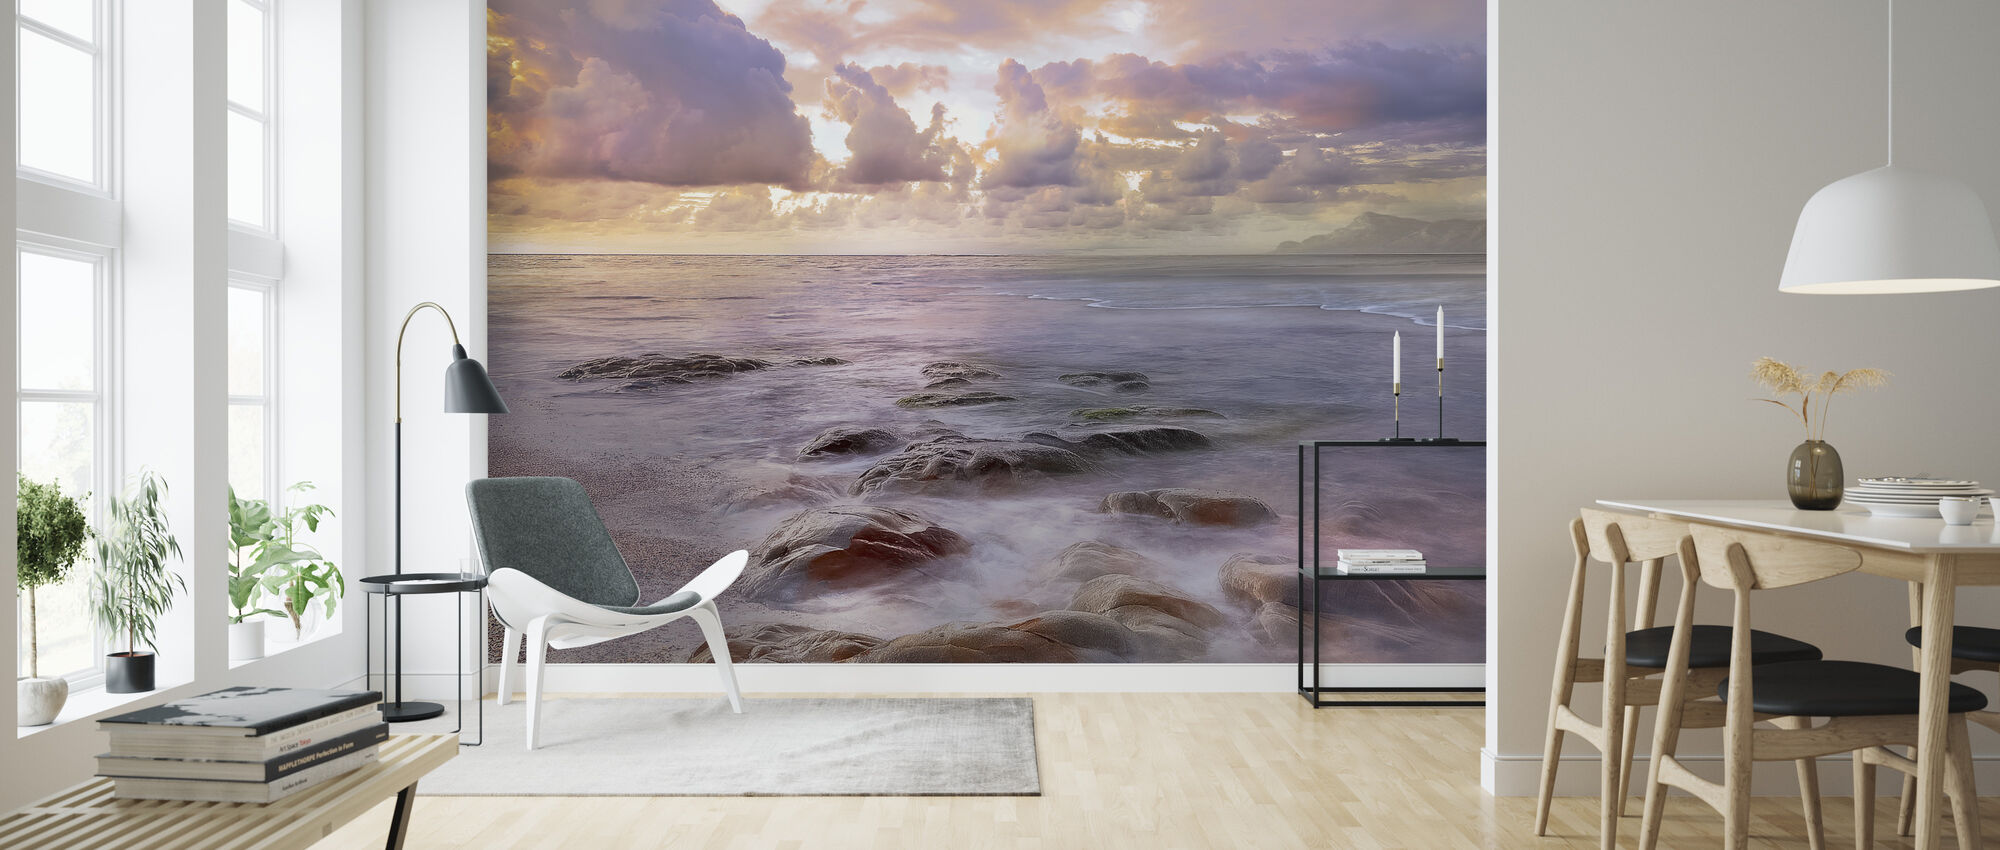 Blue Way - Wallpaper - Living Room